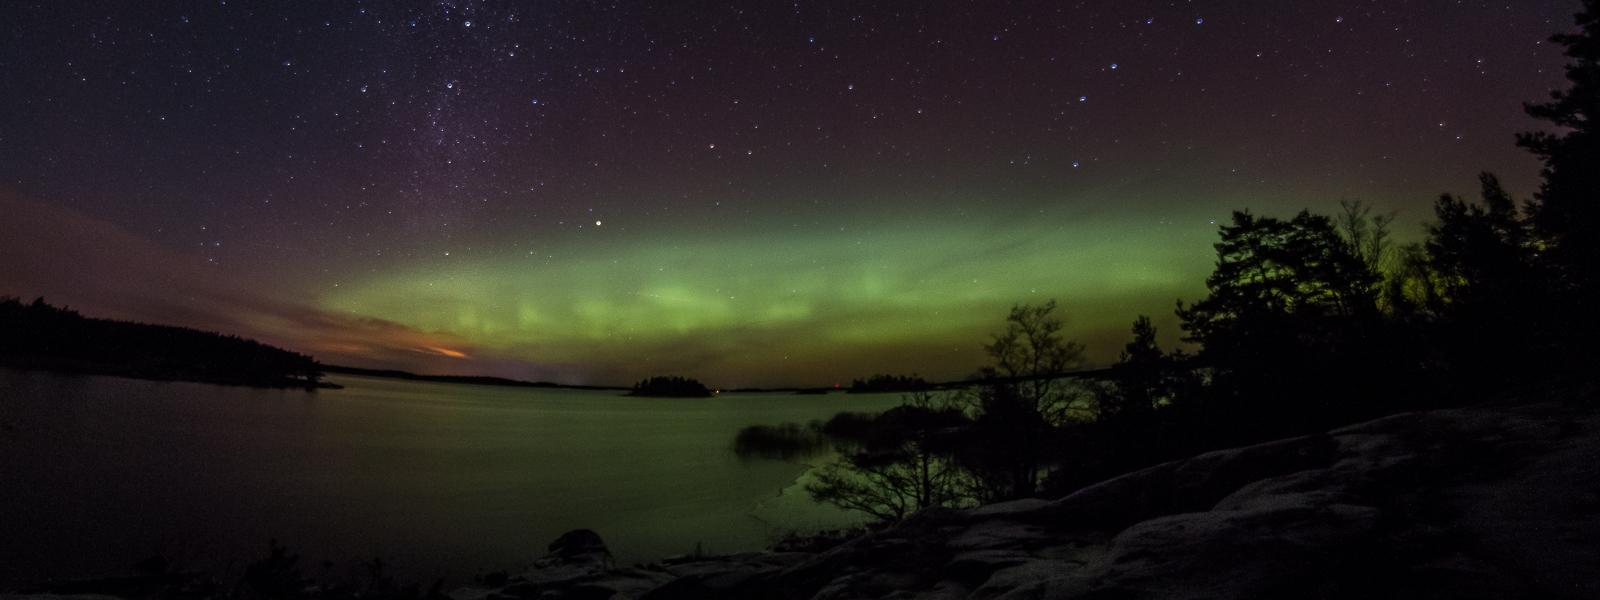 Norrskensfotografering i månsken